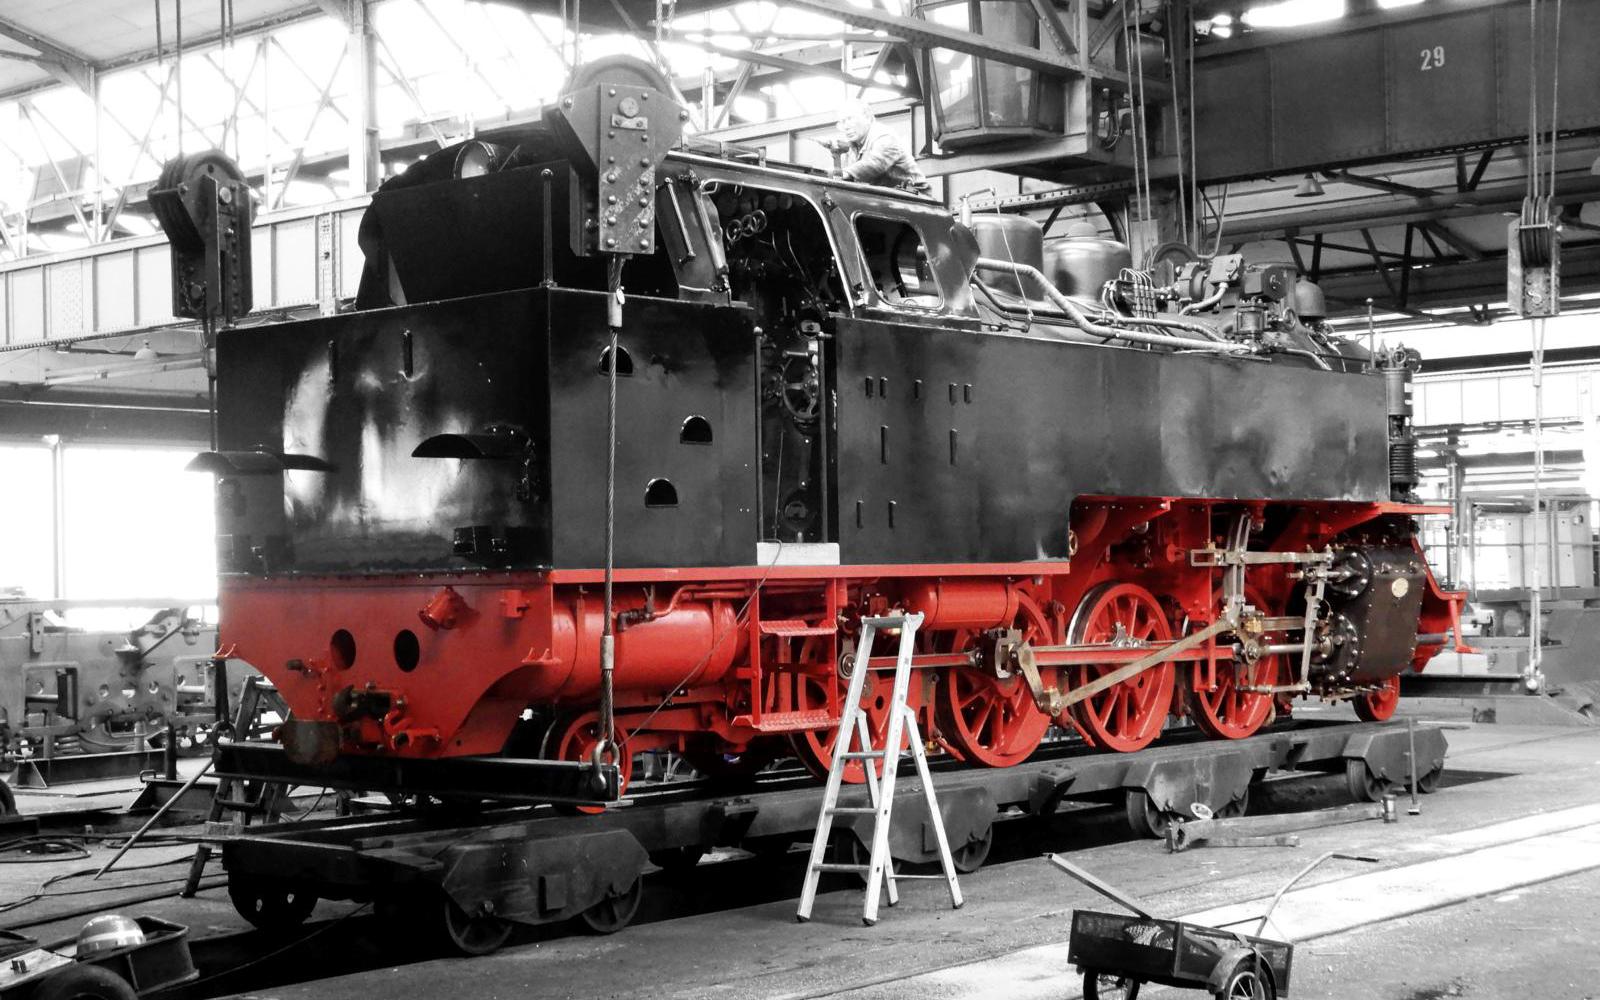 Foto: Christian Wodzinski - Tenderlokomotive